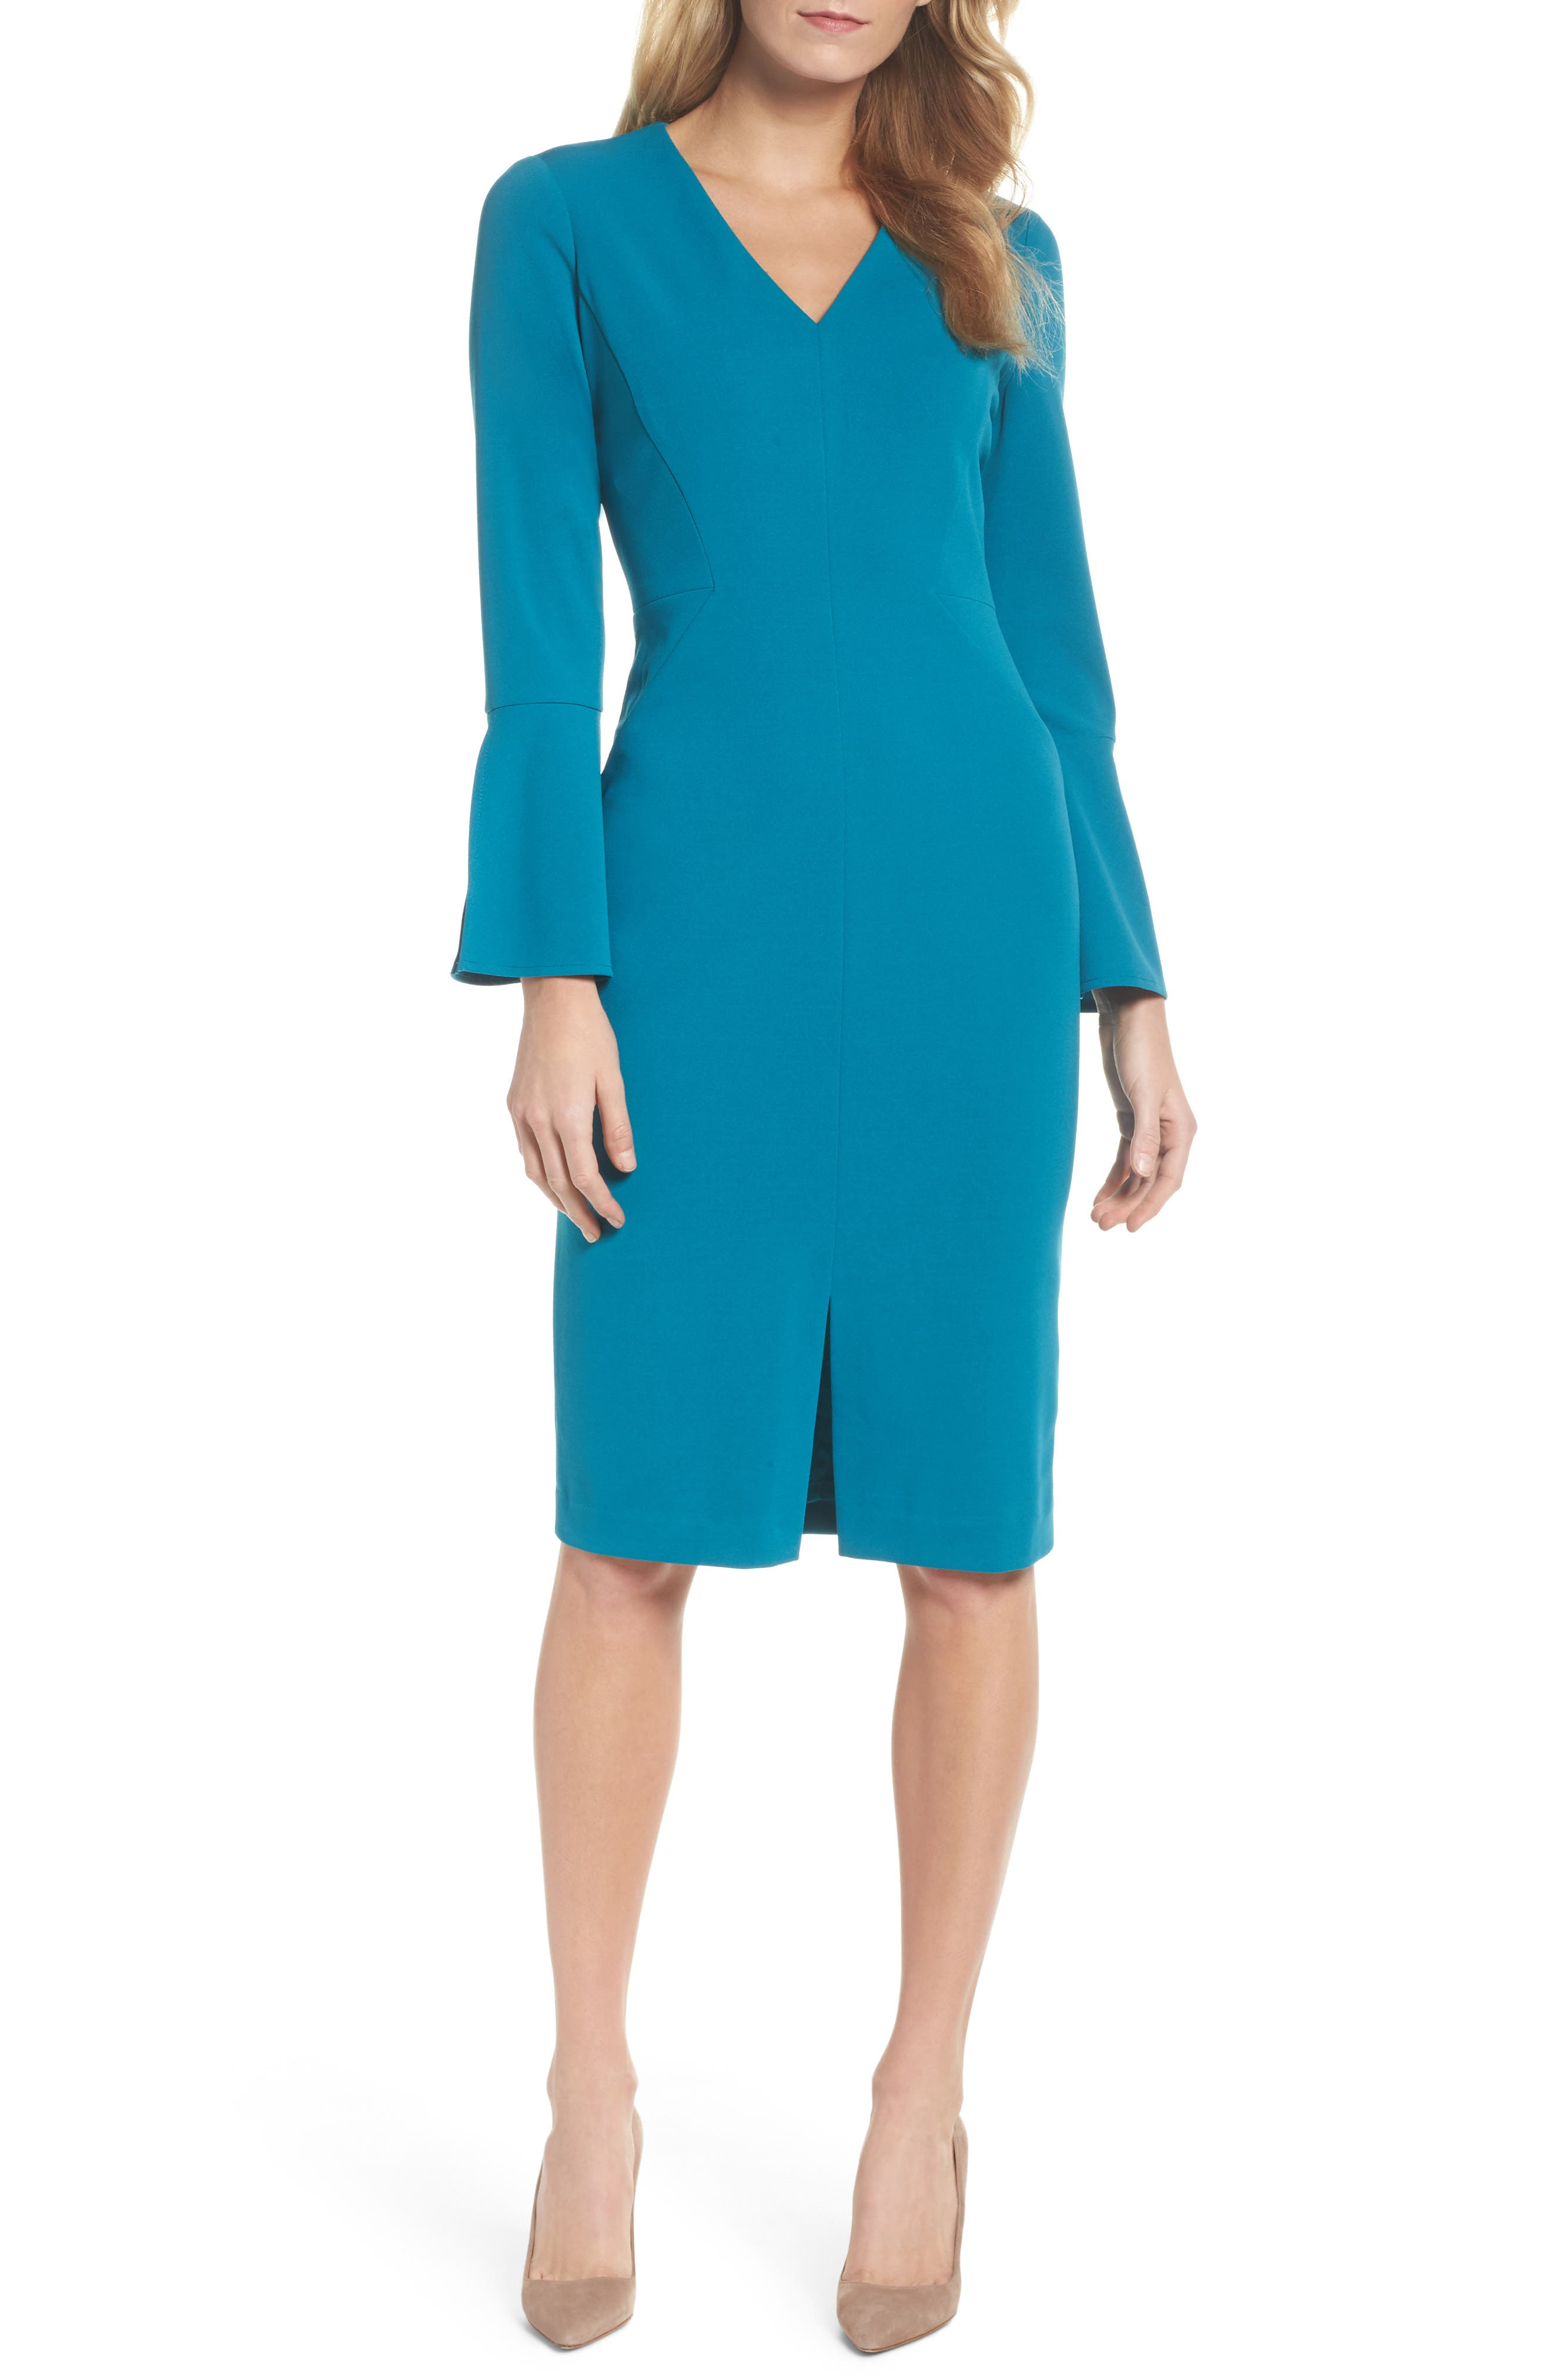 Alternate Image 1 Selected - Maggy London Bell Sleeve Sheath Dress